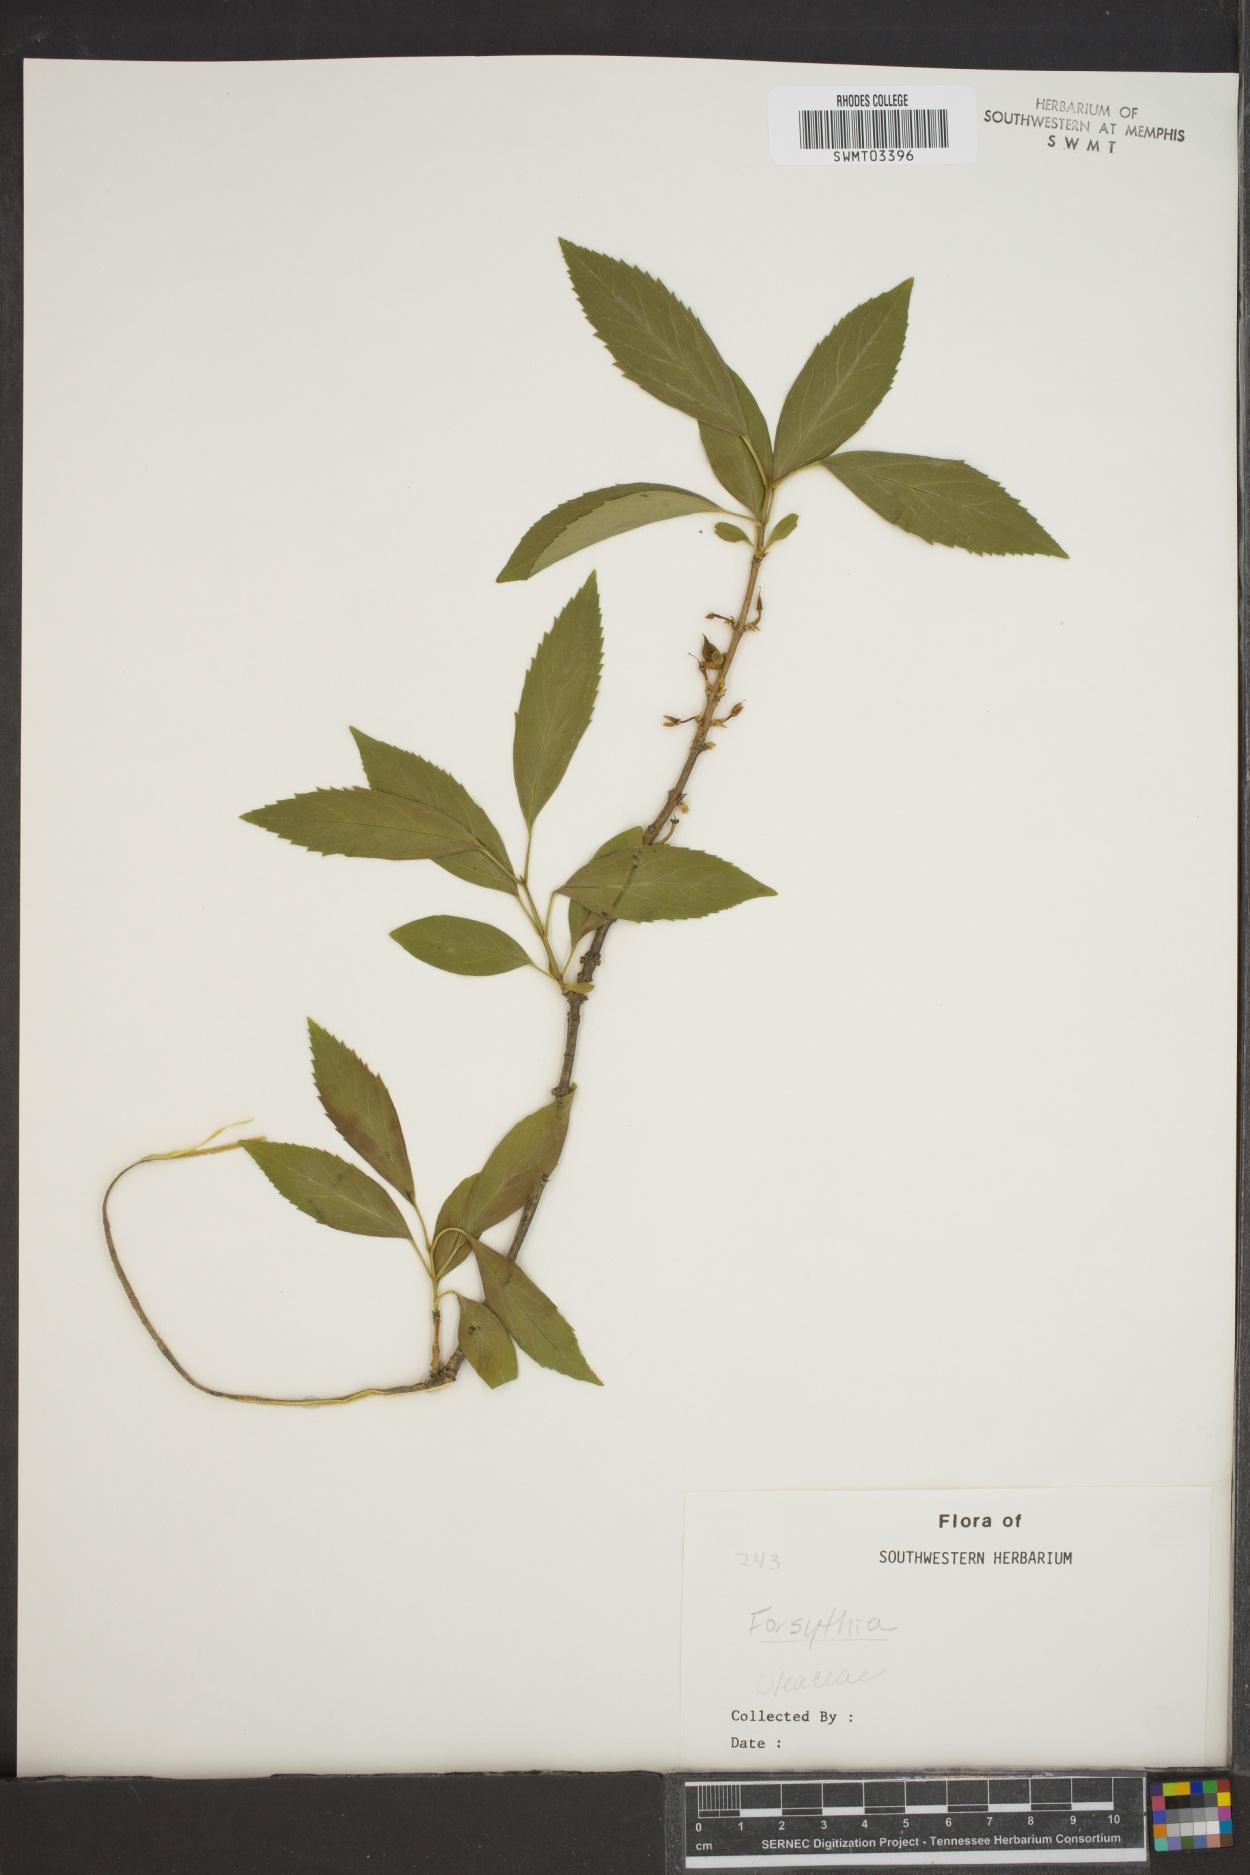 Forsythia giraldiana image